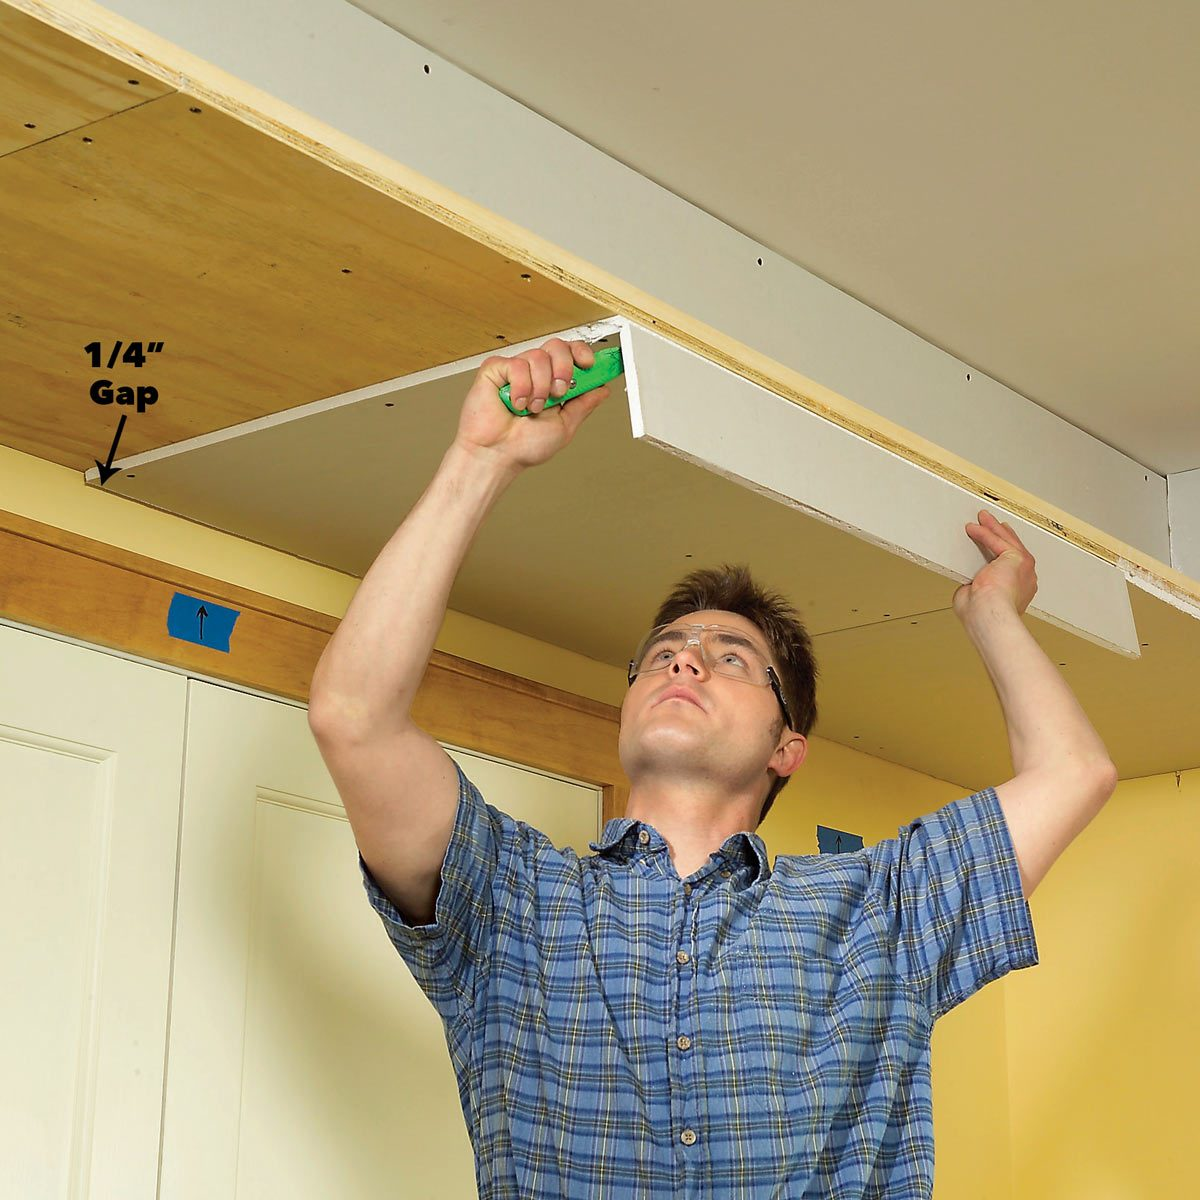 drywall underside of soffit box